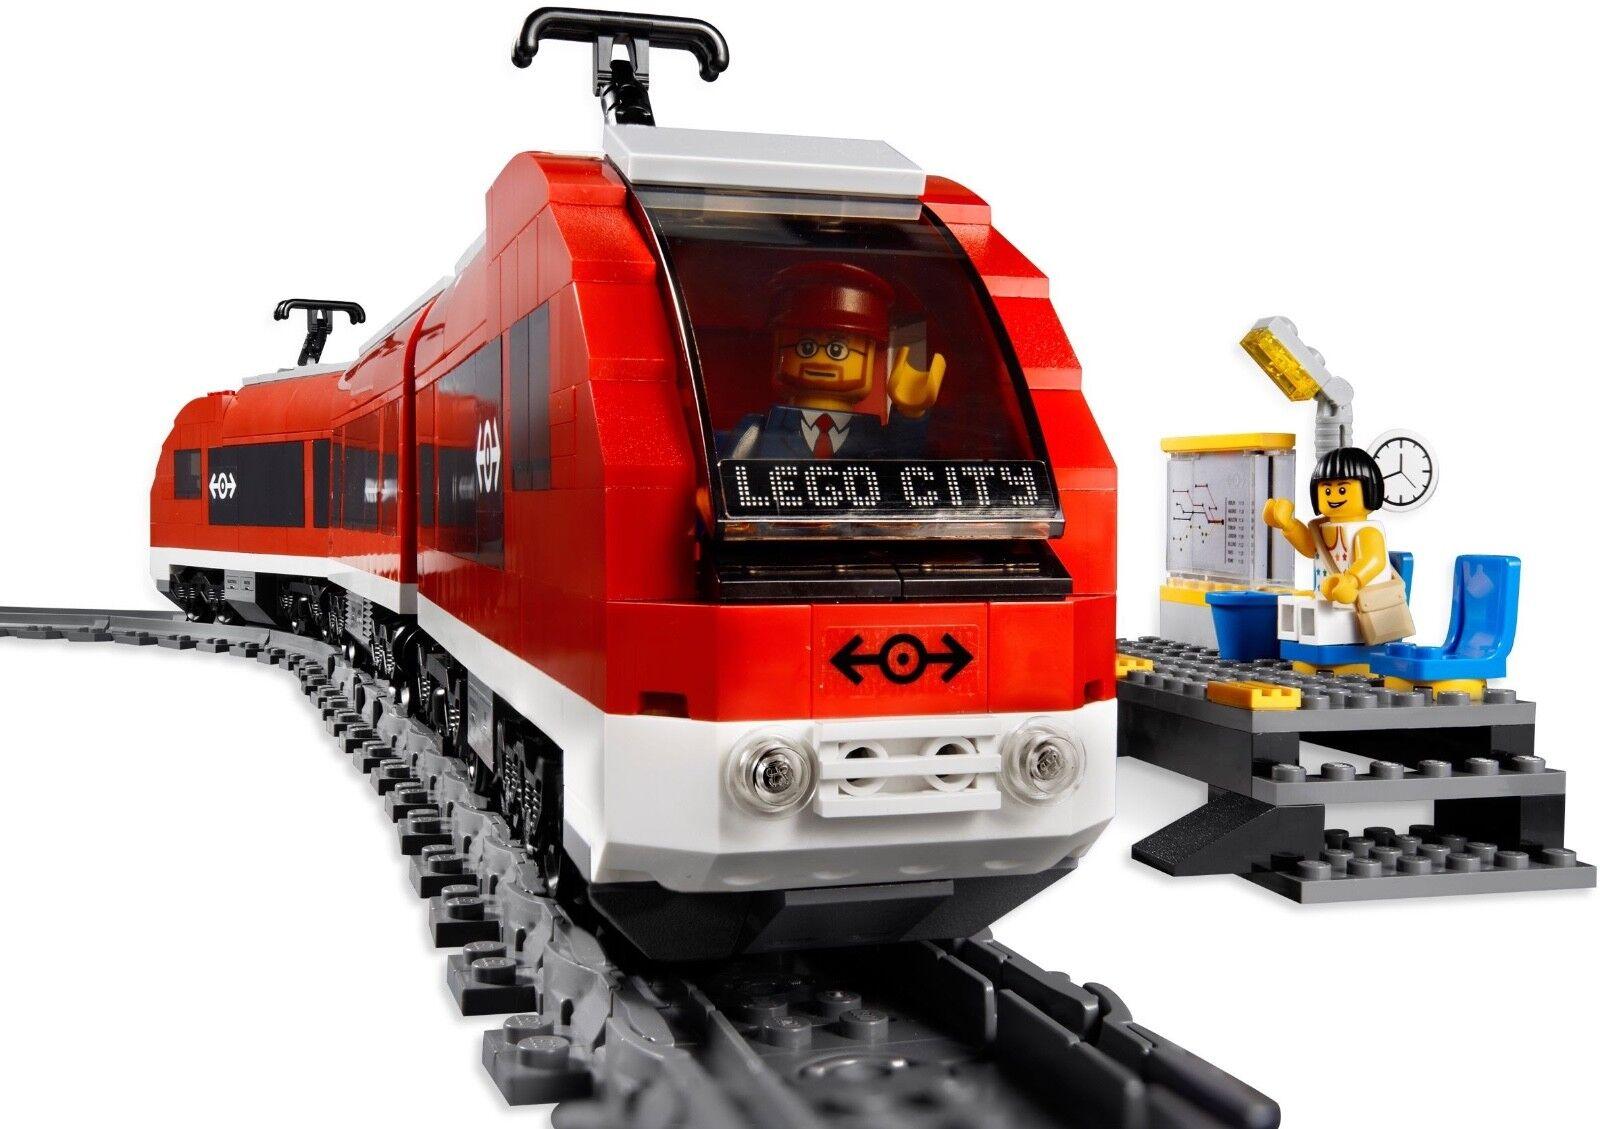 LEGO ® Passenger Train 7938 - Electric - Release: 2010 - 100% complete